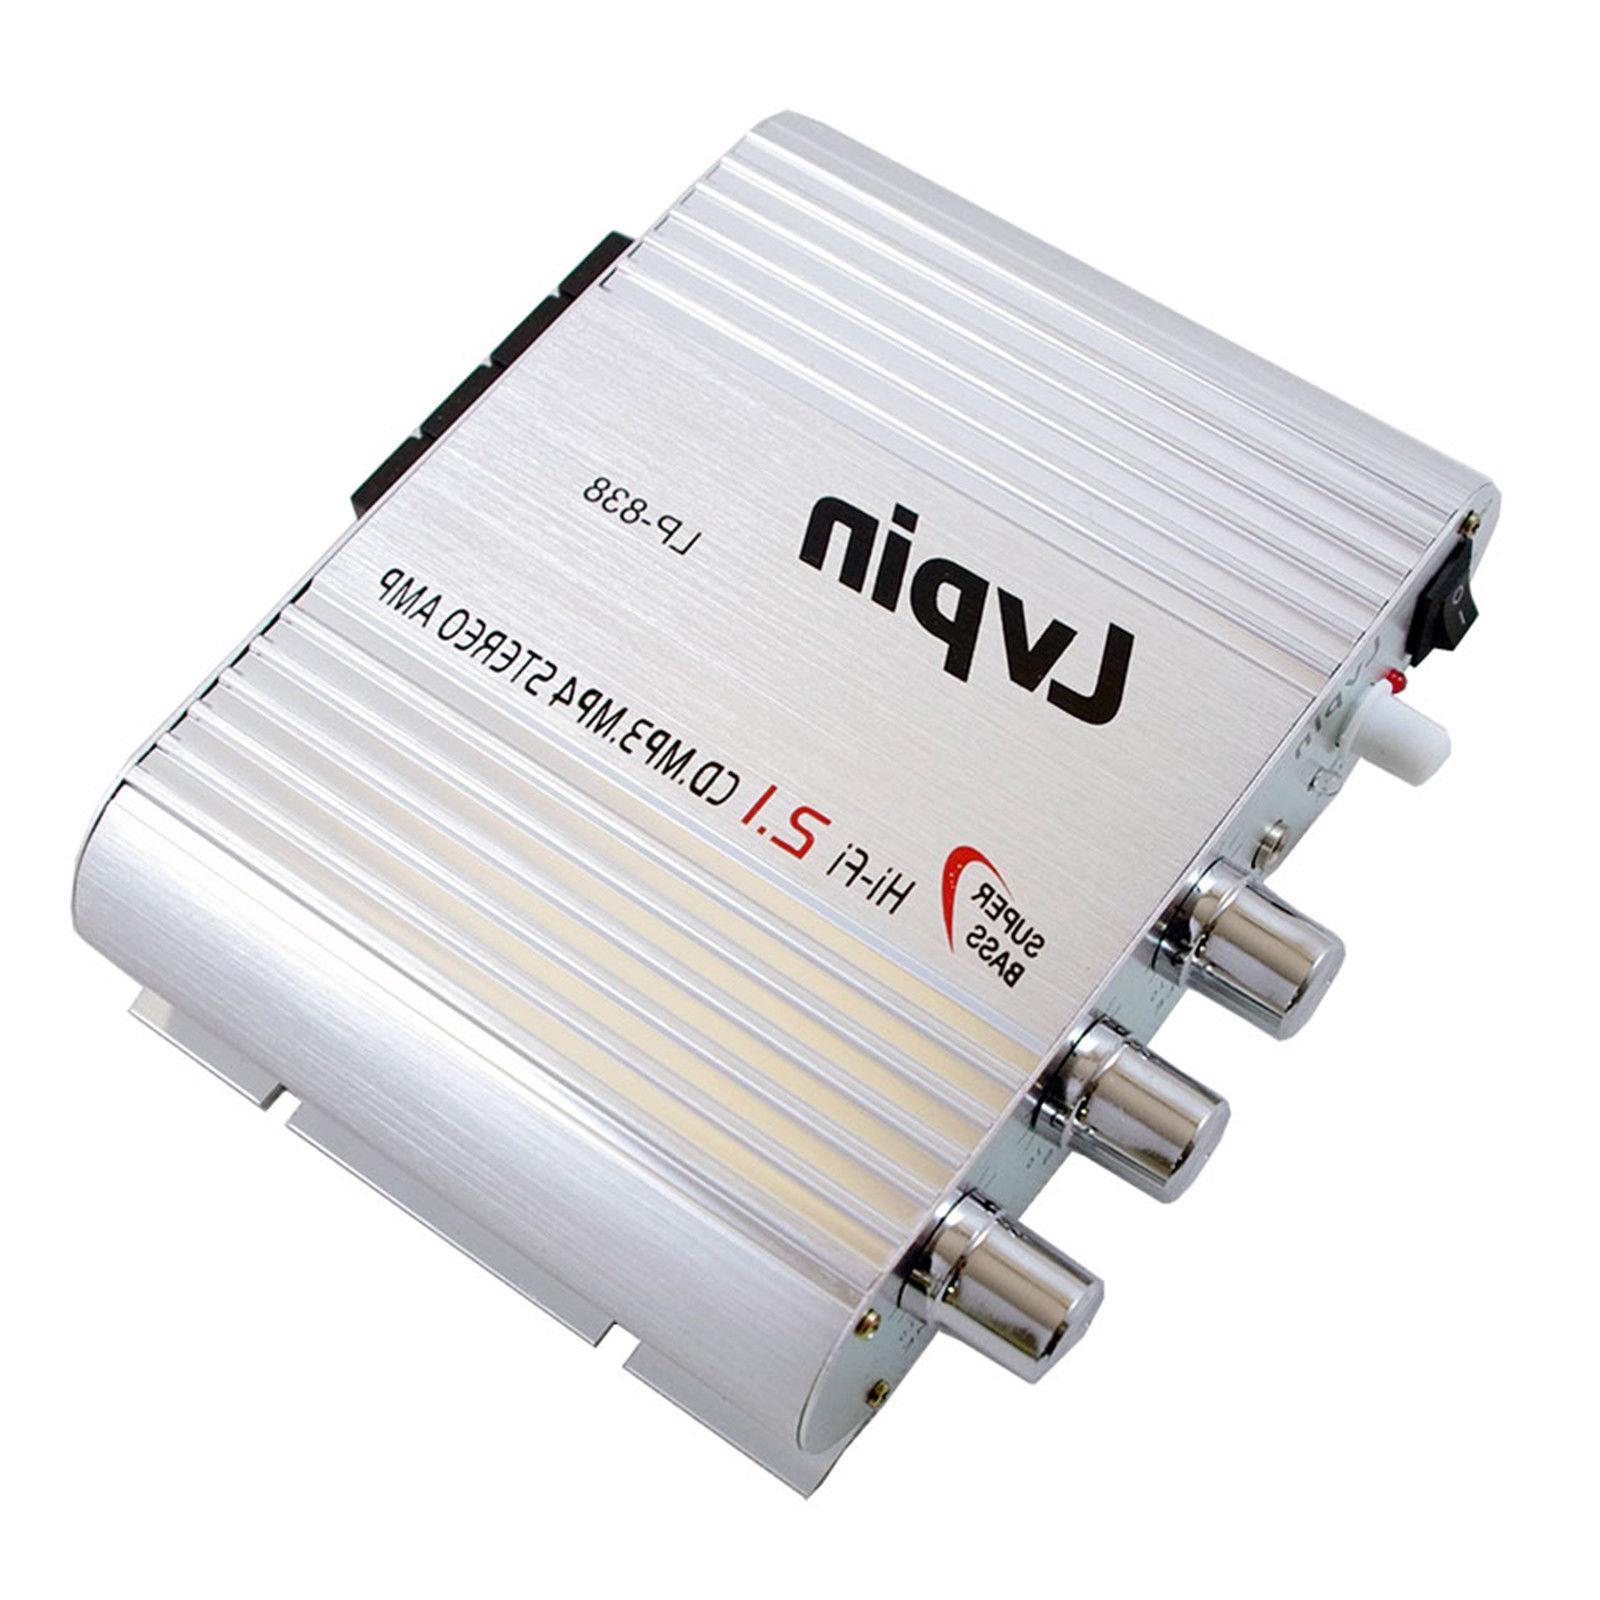 Lvpin 2.1 Mini Amplifier Amp Stereo Audio 200W 12V & AC Adapter